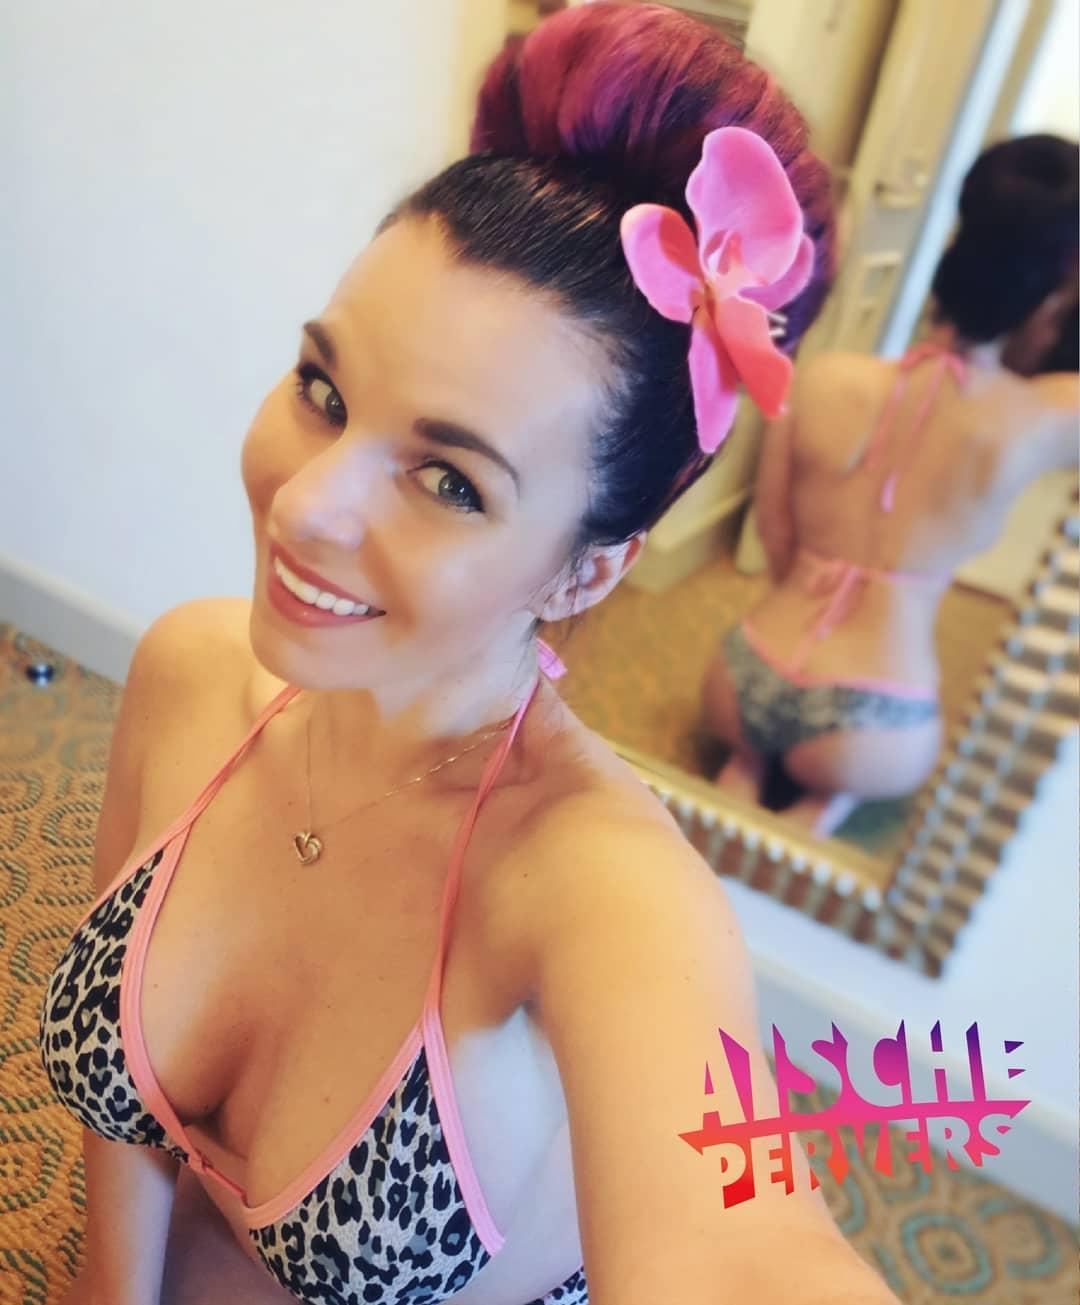 Ein Lächeln ist das beste Make up der Frau. #smile #happyness #bikini #ootd #holiday #dubai #ombrehair #curvygirl #curvy #booty #fun #enjoylife #love #german #fit #flowers #vacation